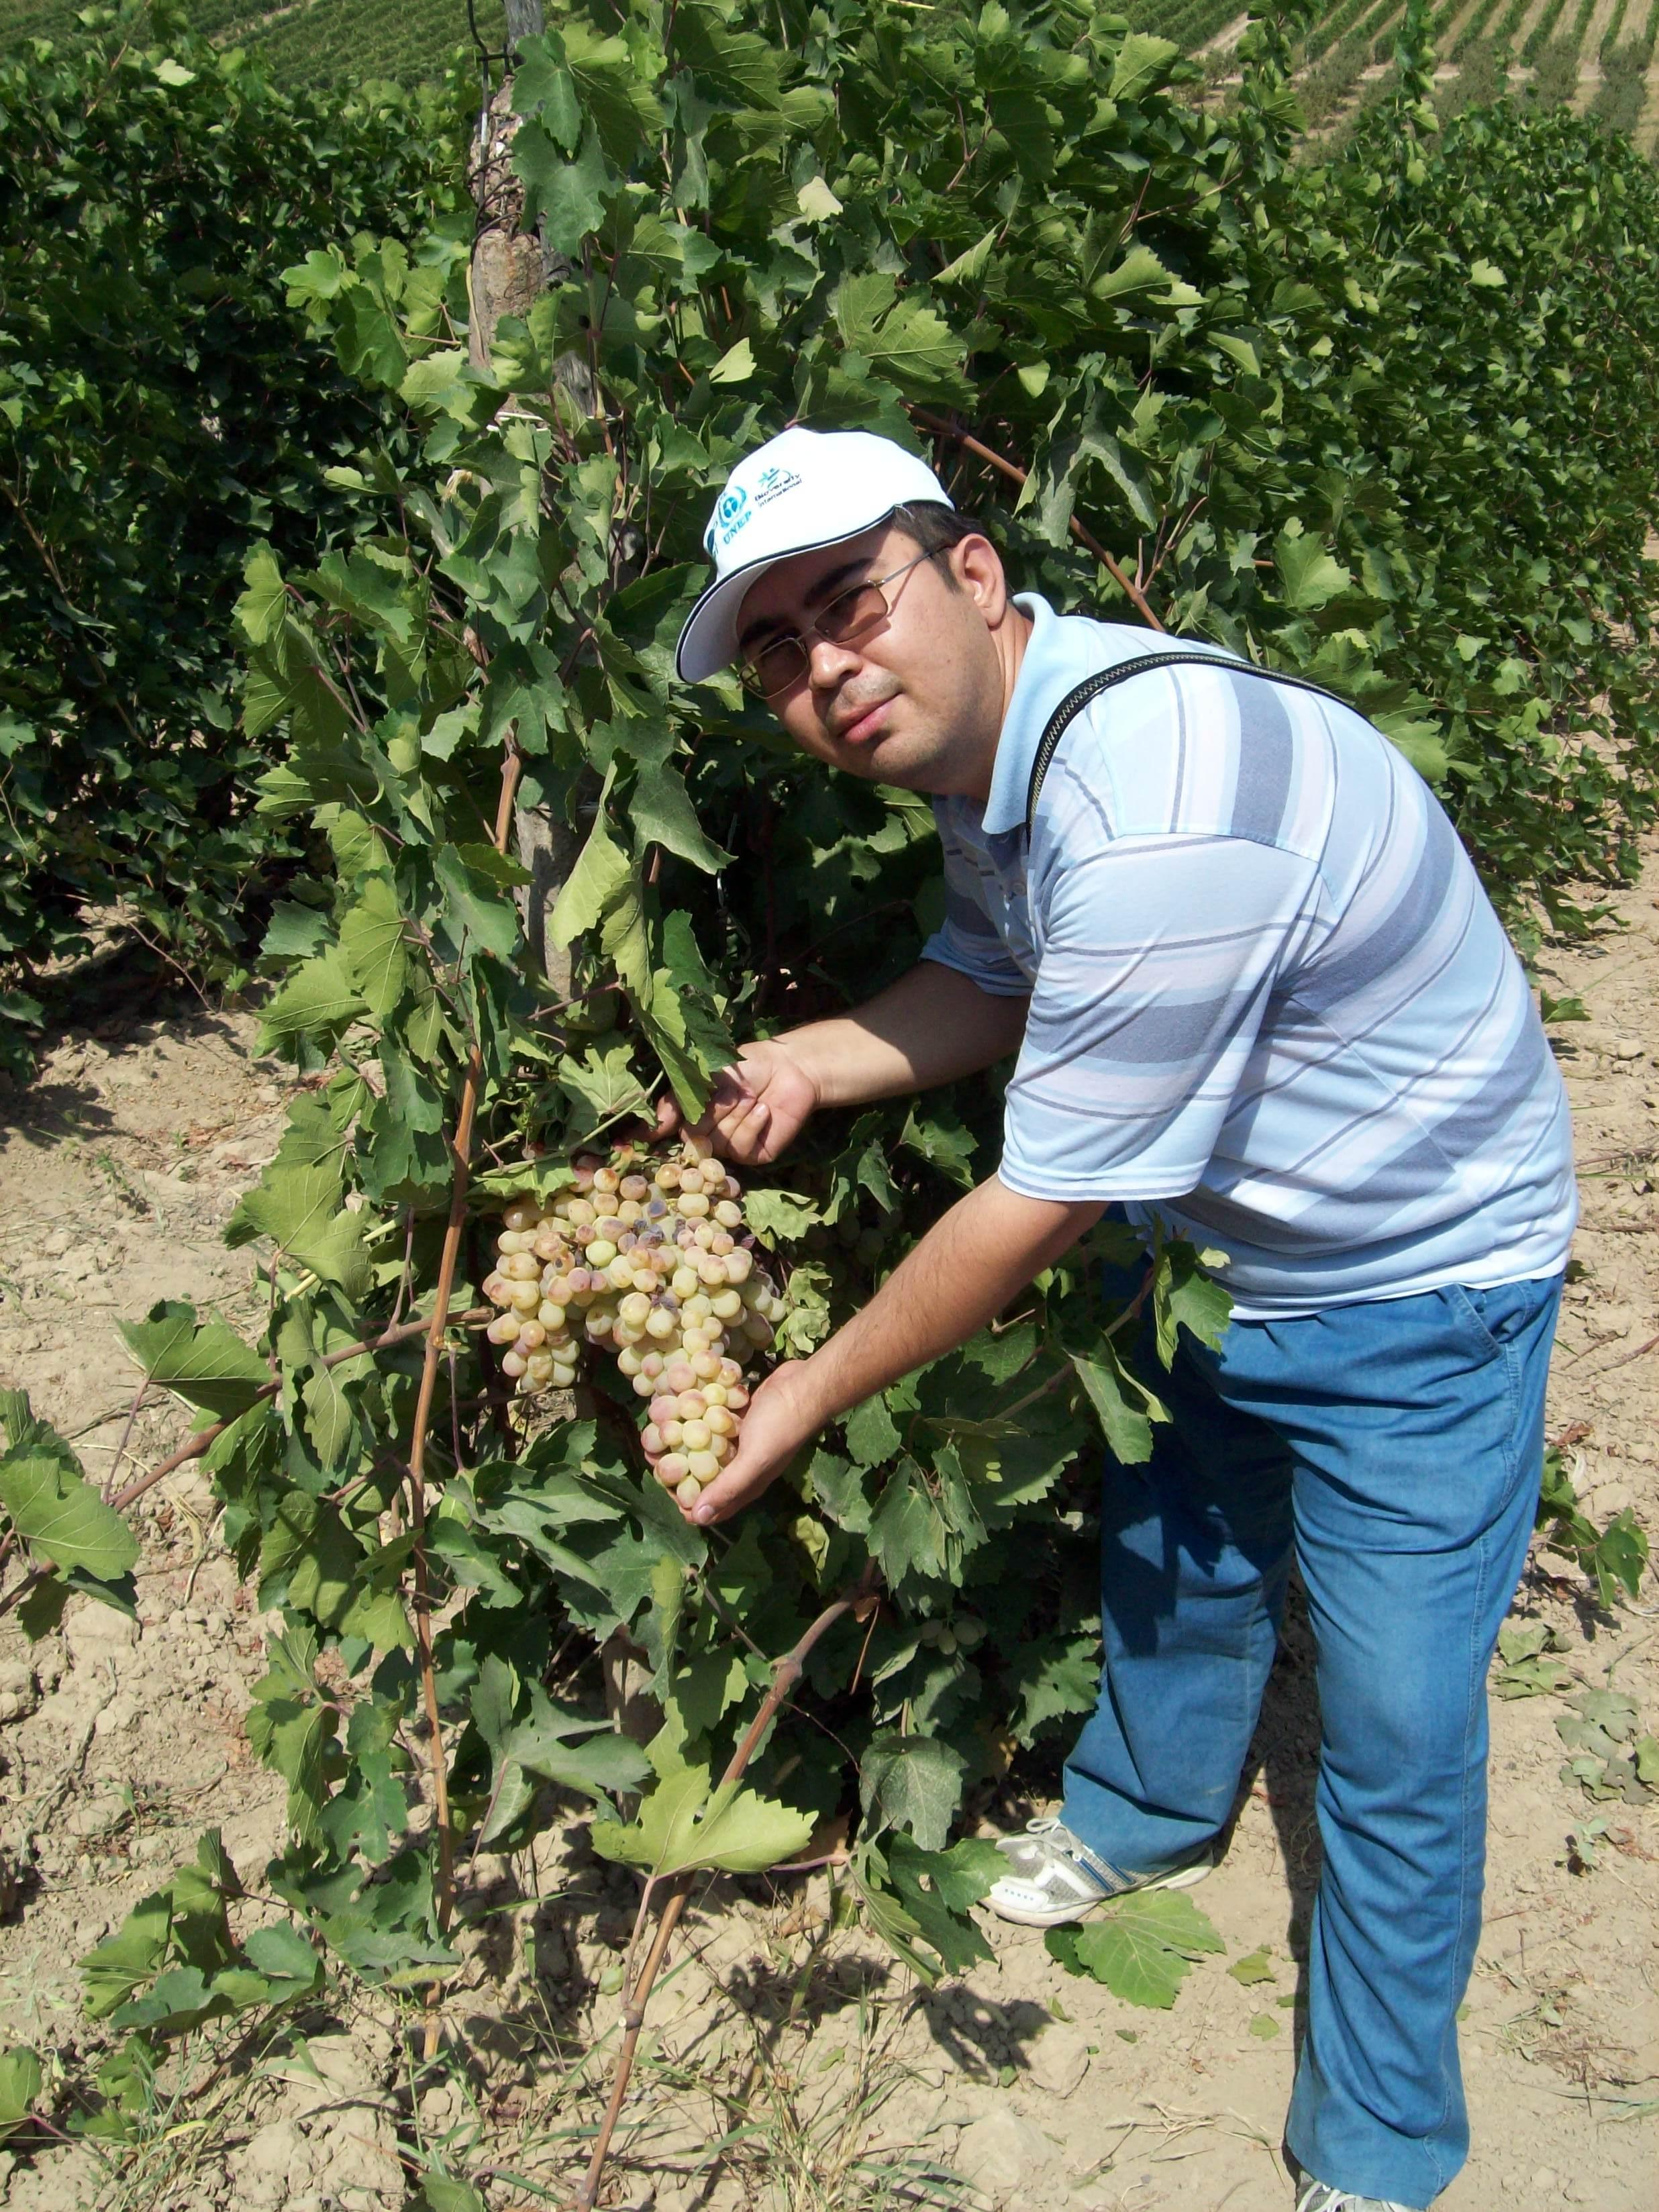 File:Местный сорт винограда Тайфи белый (Паркентский район Ташкентской области).jpg - Wikimedia Commons